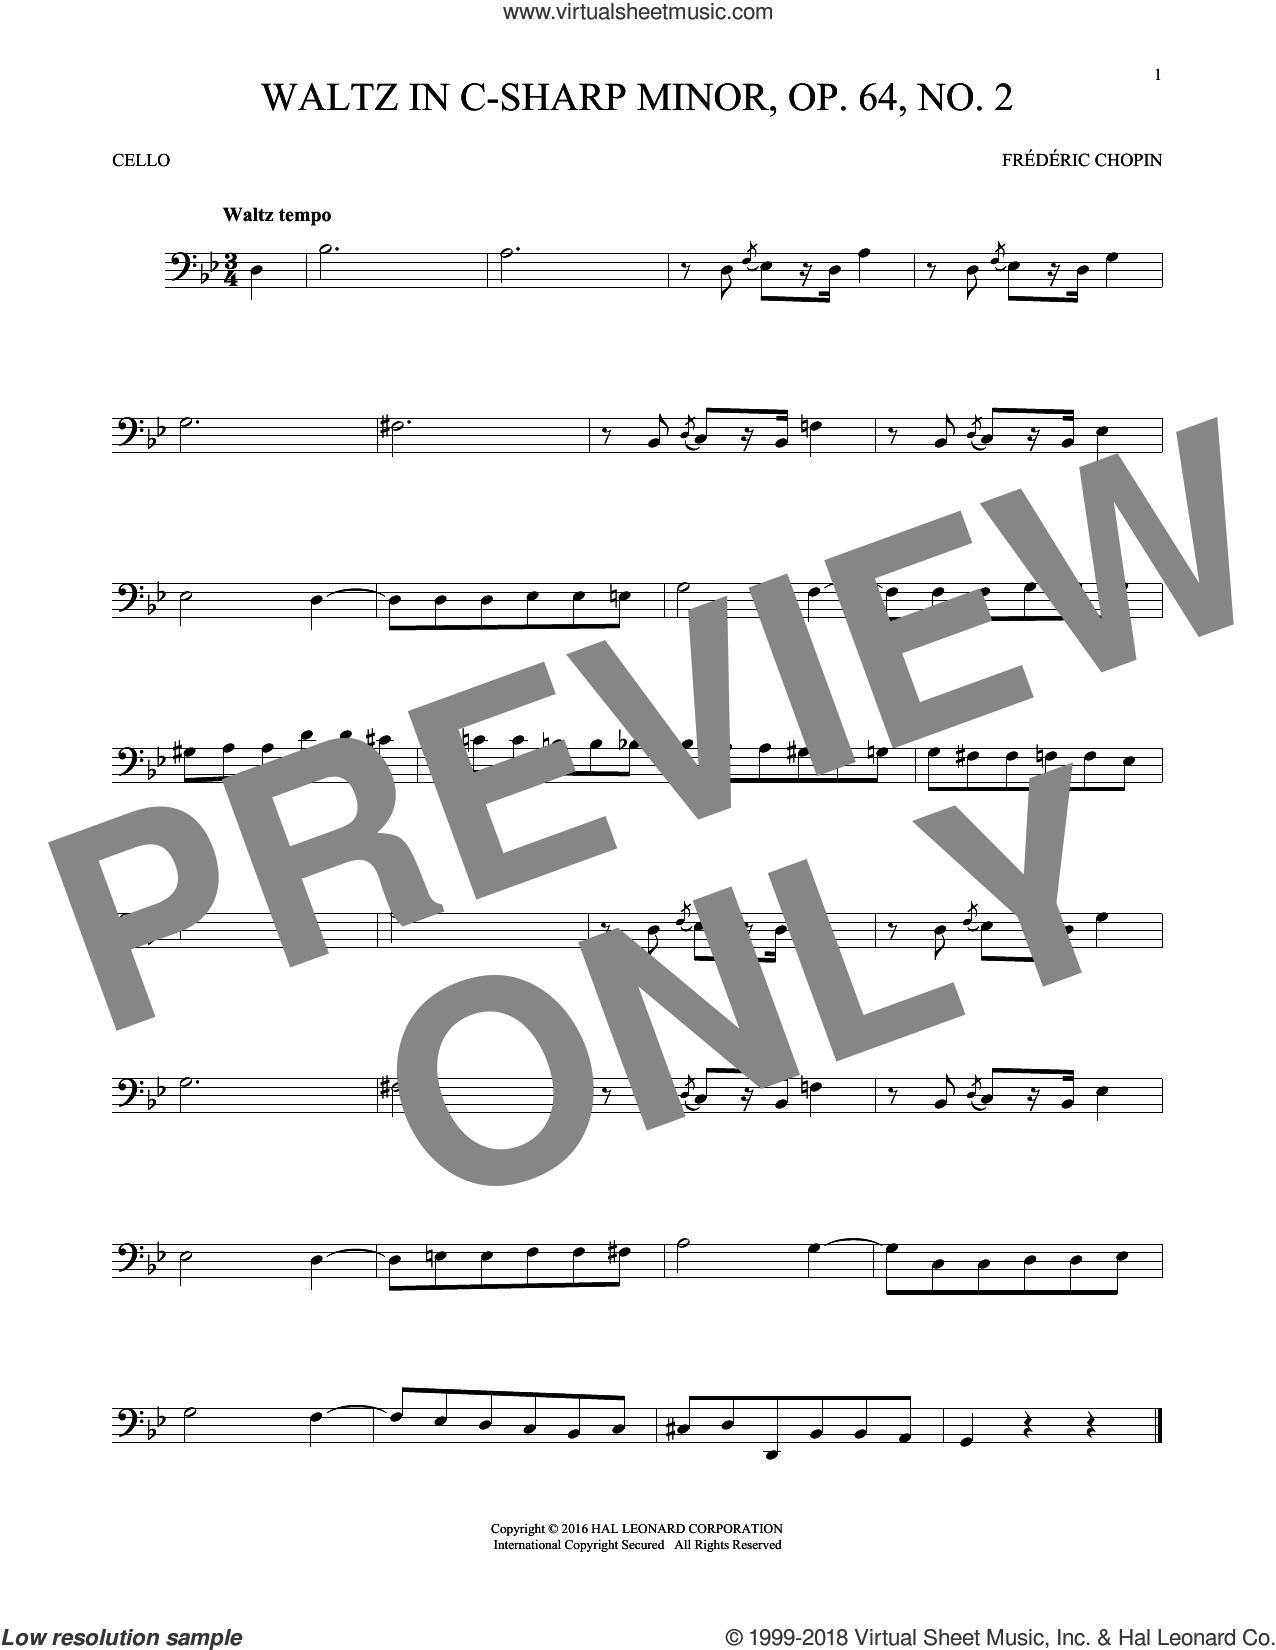 Waltz In C-Sharp Minor, Op. 64, No. 2 sheet music for cello solo by Frederic Chopin, classical score, intermediate skill level